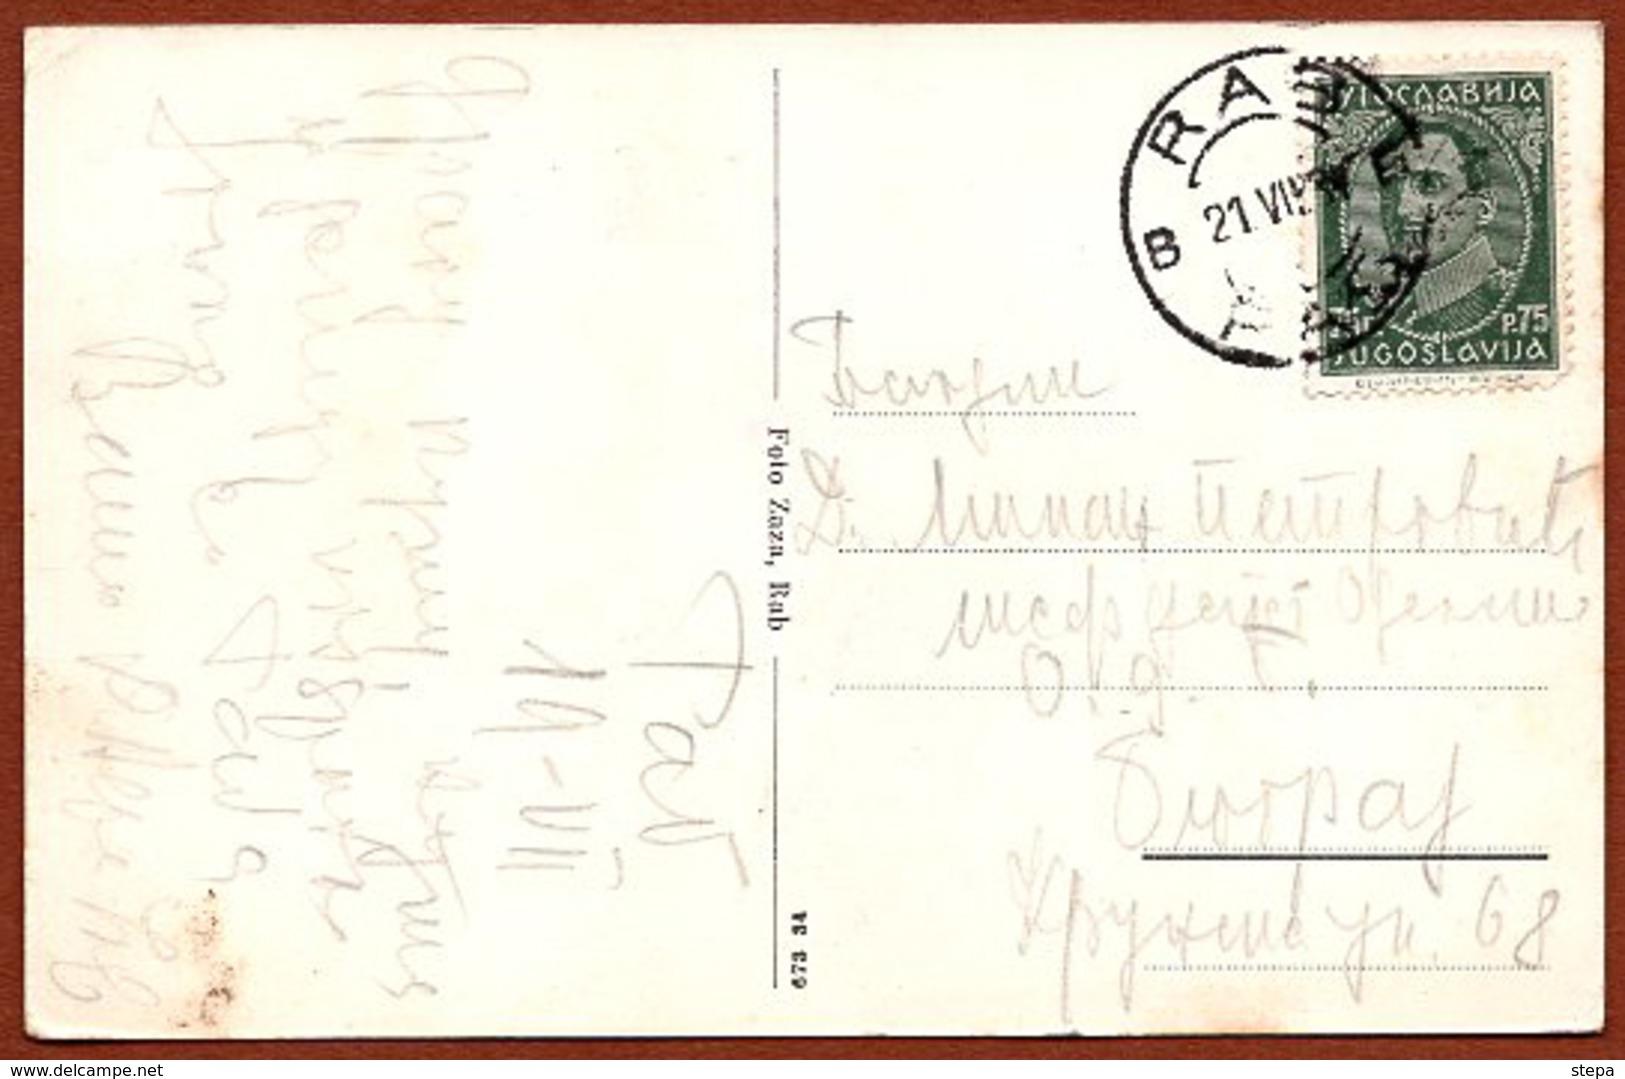 CROATIA, RAB ISLAND PICTURE POSTCARD 1934 RARE!!!!!!!!!! - Croatia